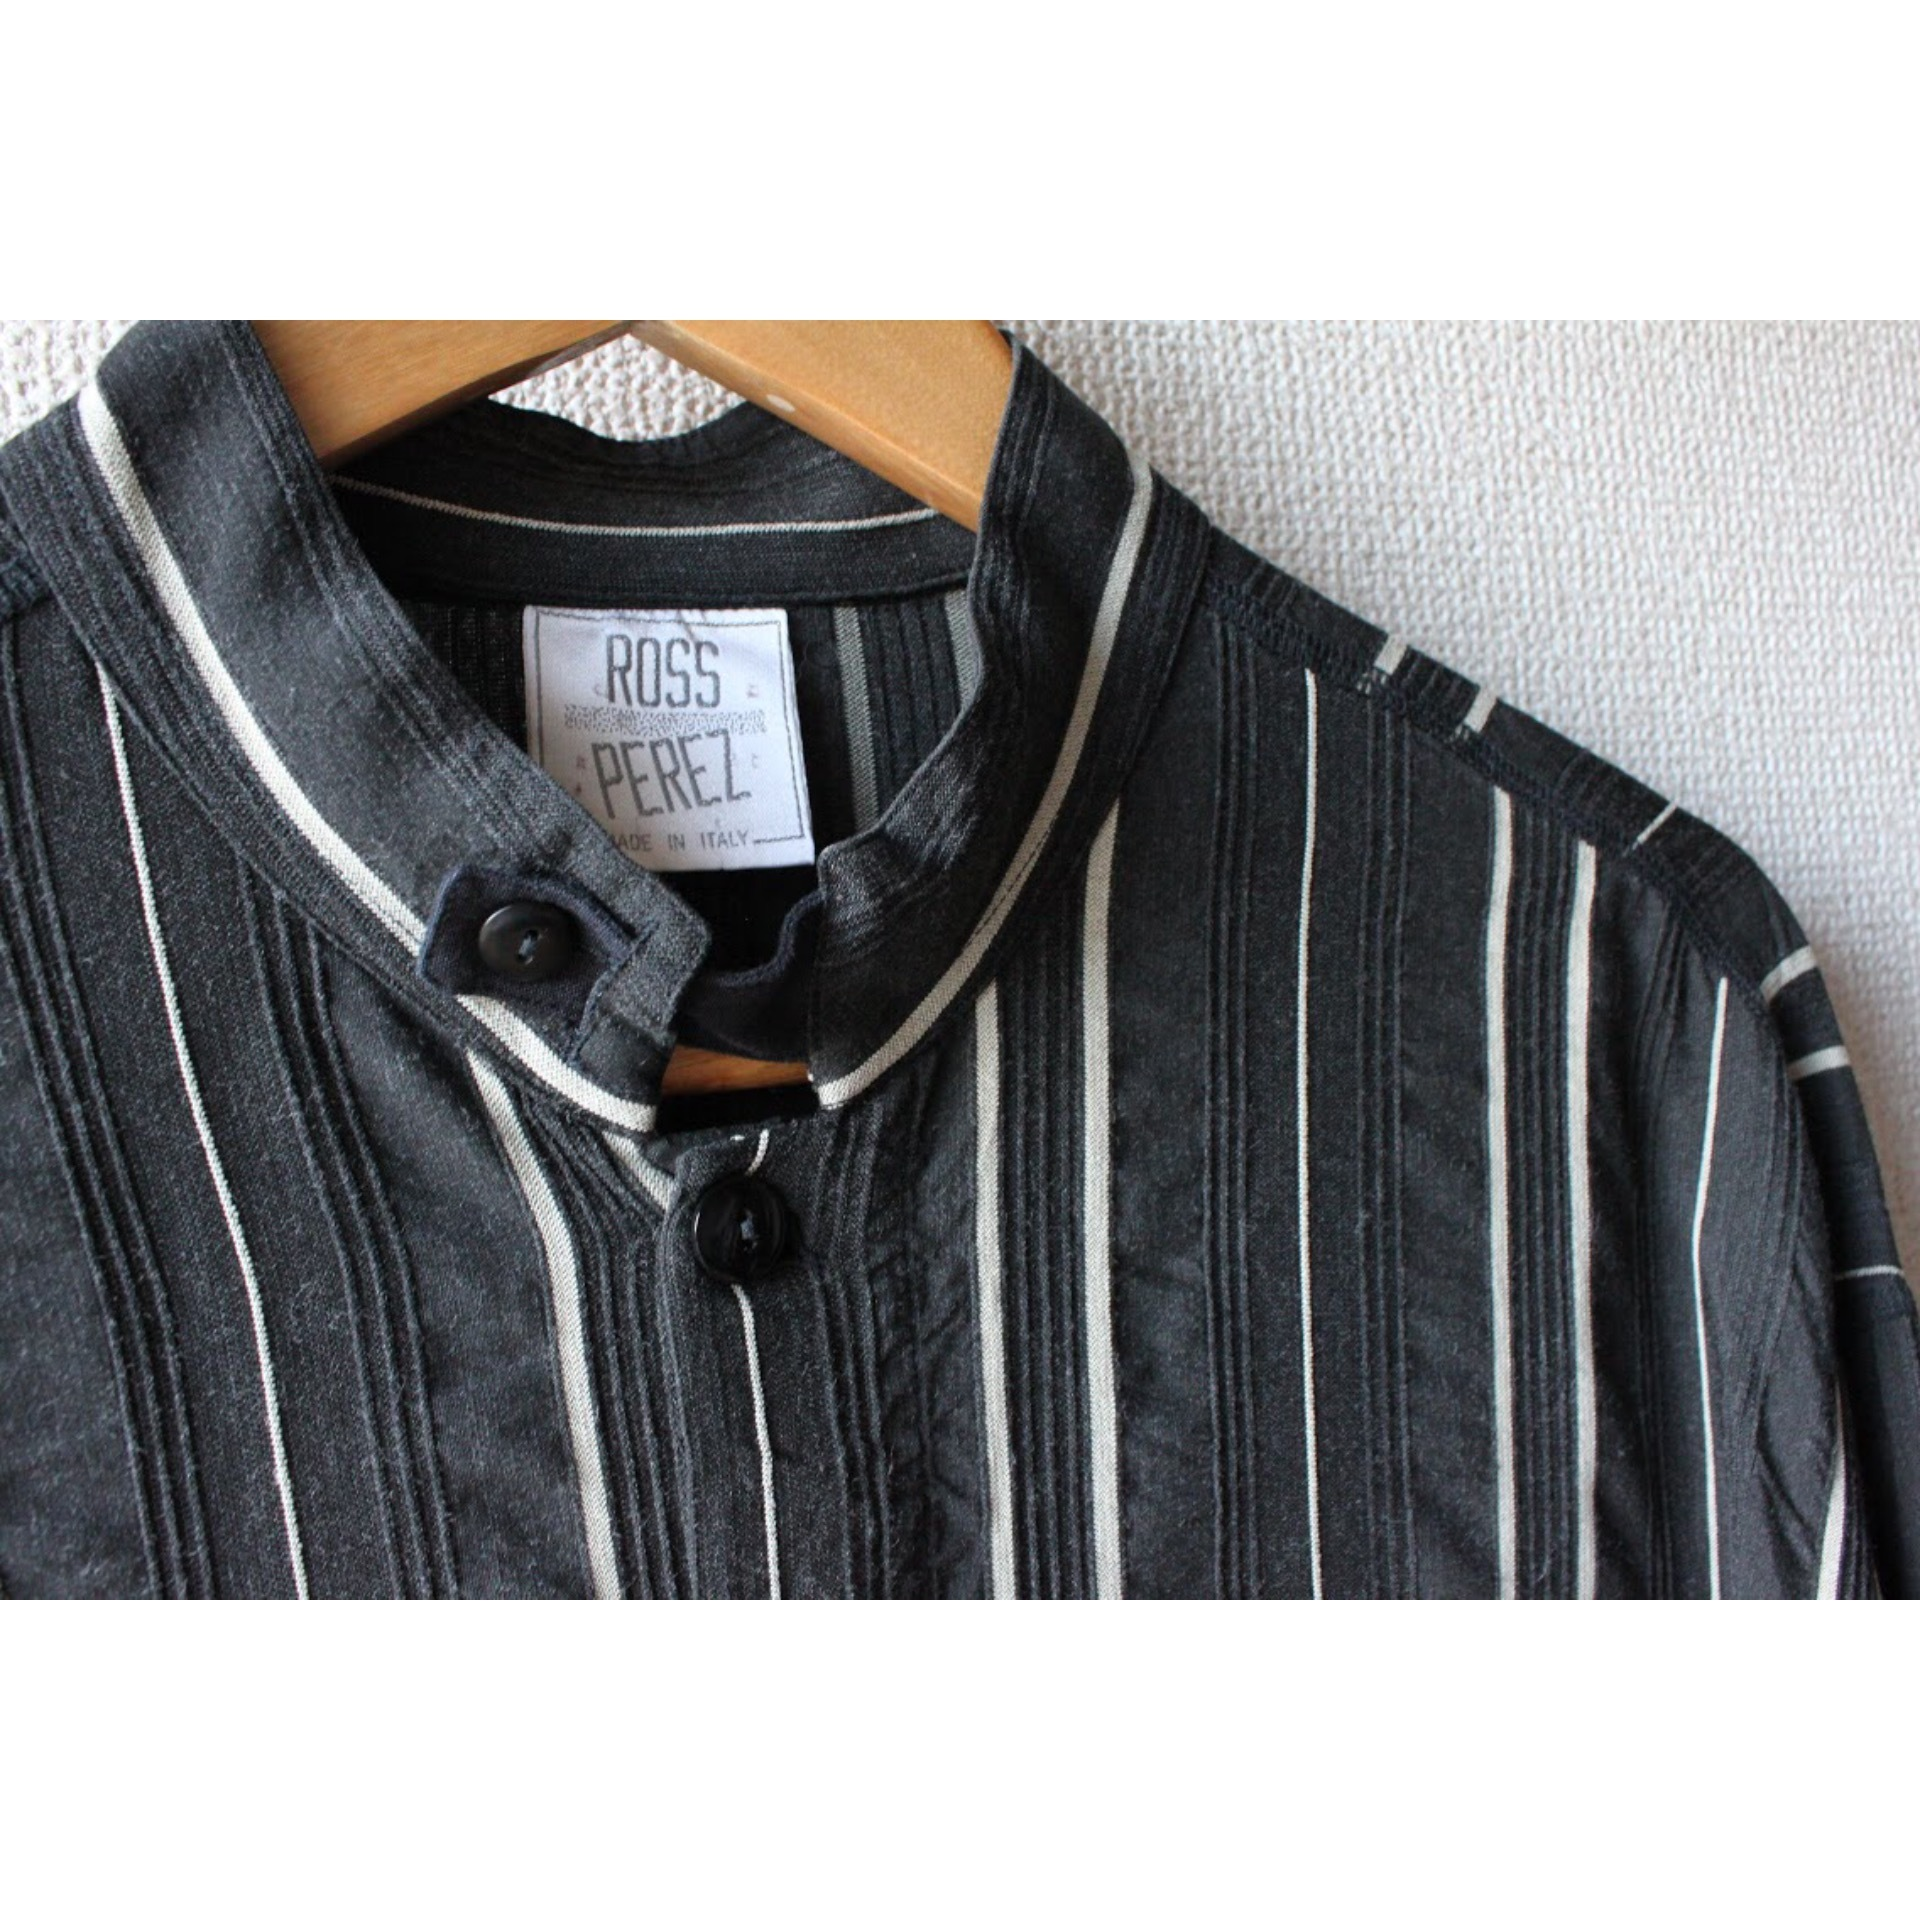 Vintage stand collar shirt